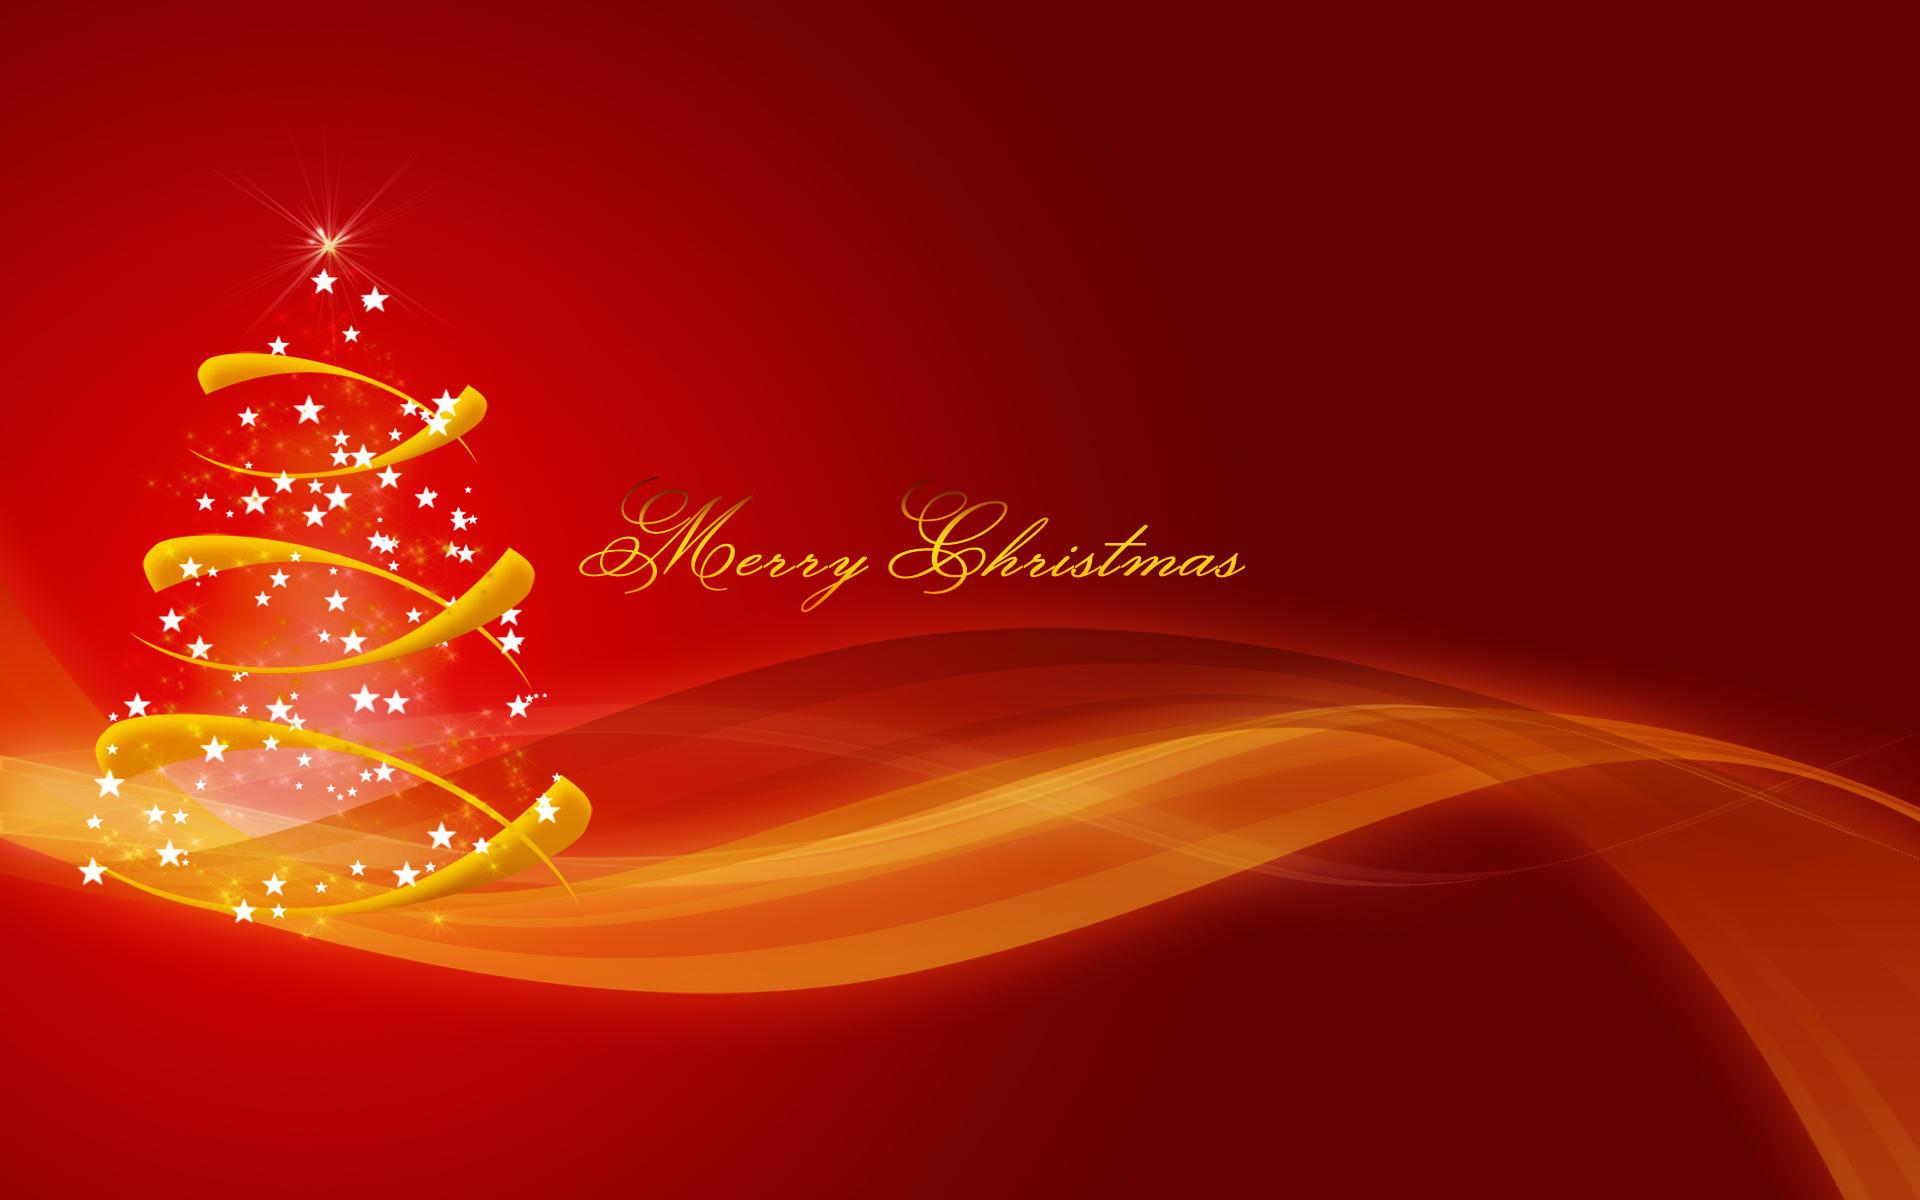 http://fc04.deviantart.net/fs22/i/2007/333/4/8/Merry_Christmas_2007_by_DigitalPhenom.jpg